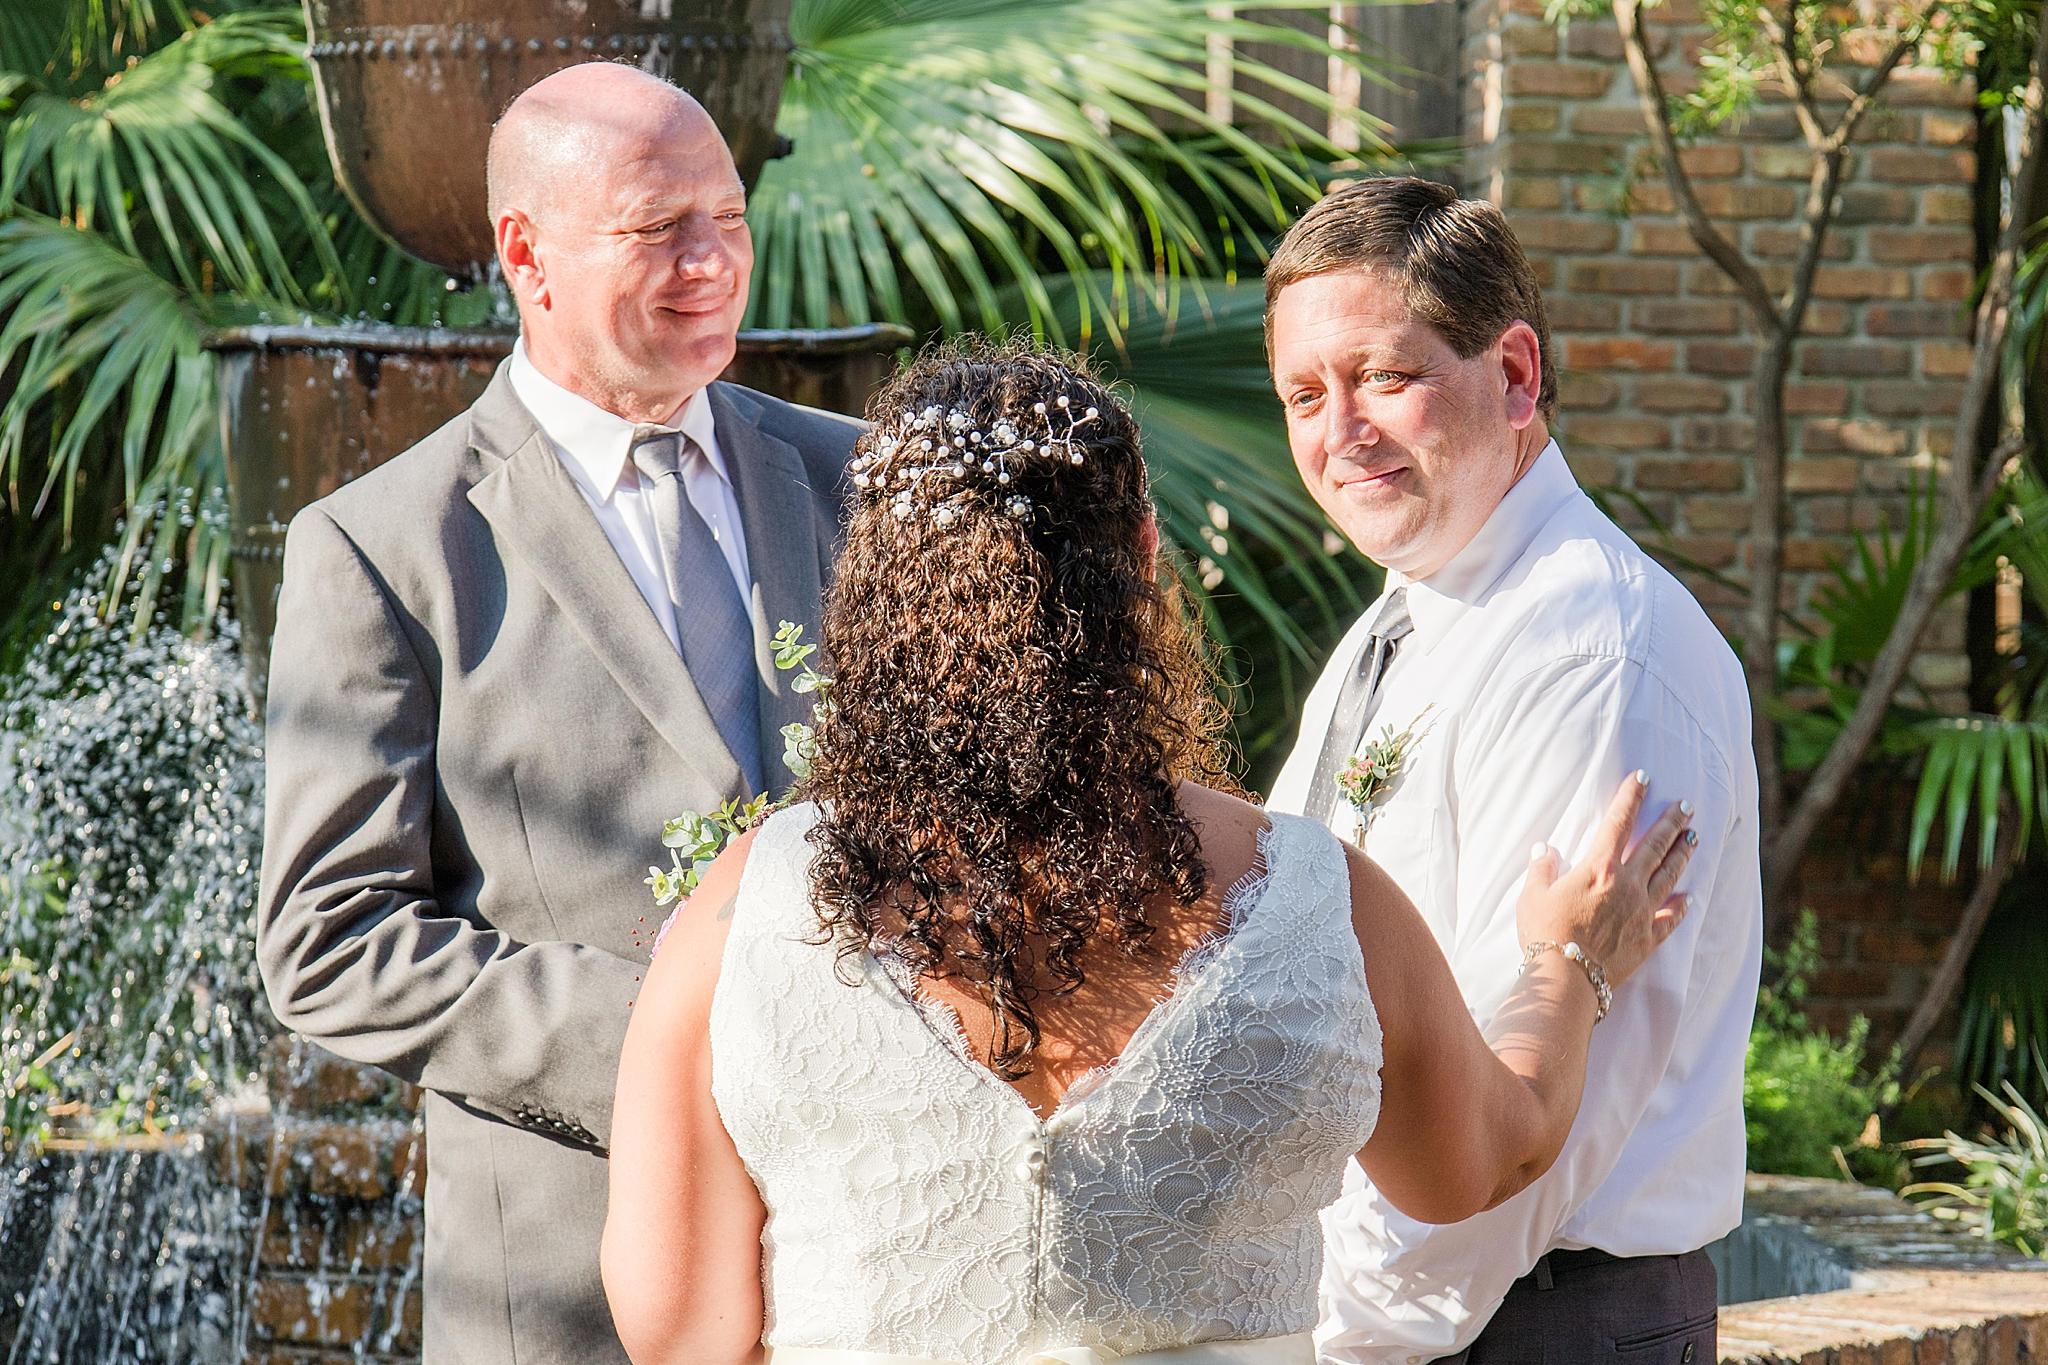 bride reaches groom for wedding ceremony at Seville Quarter